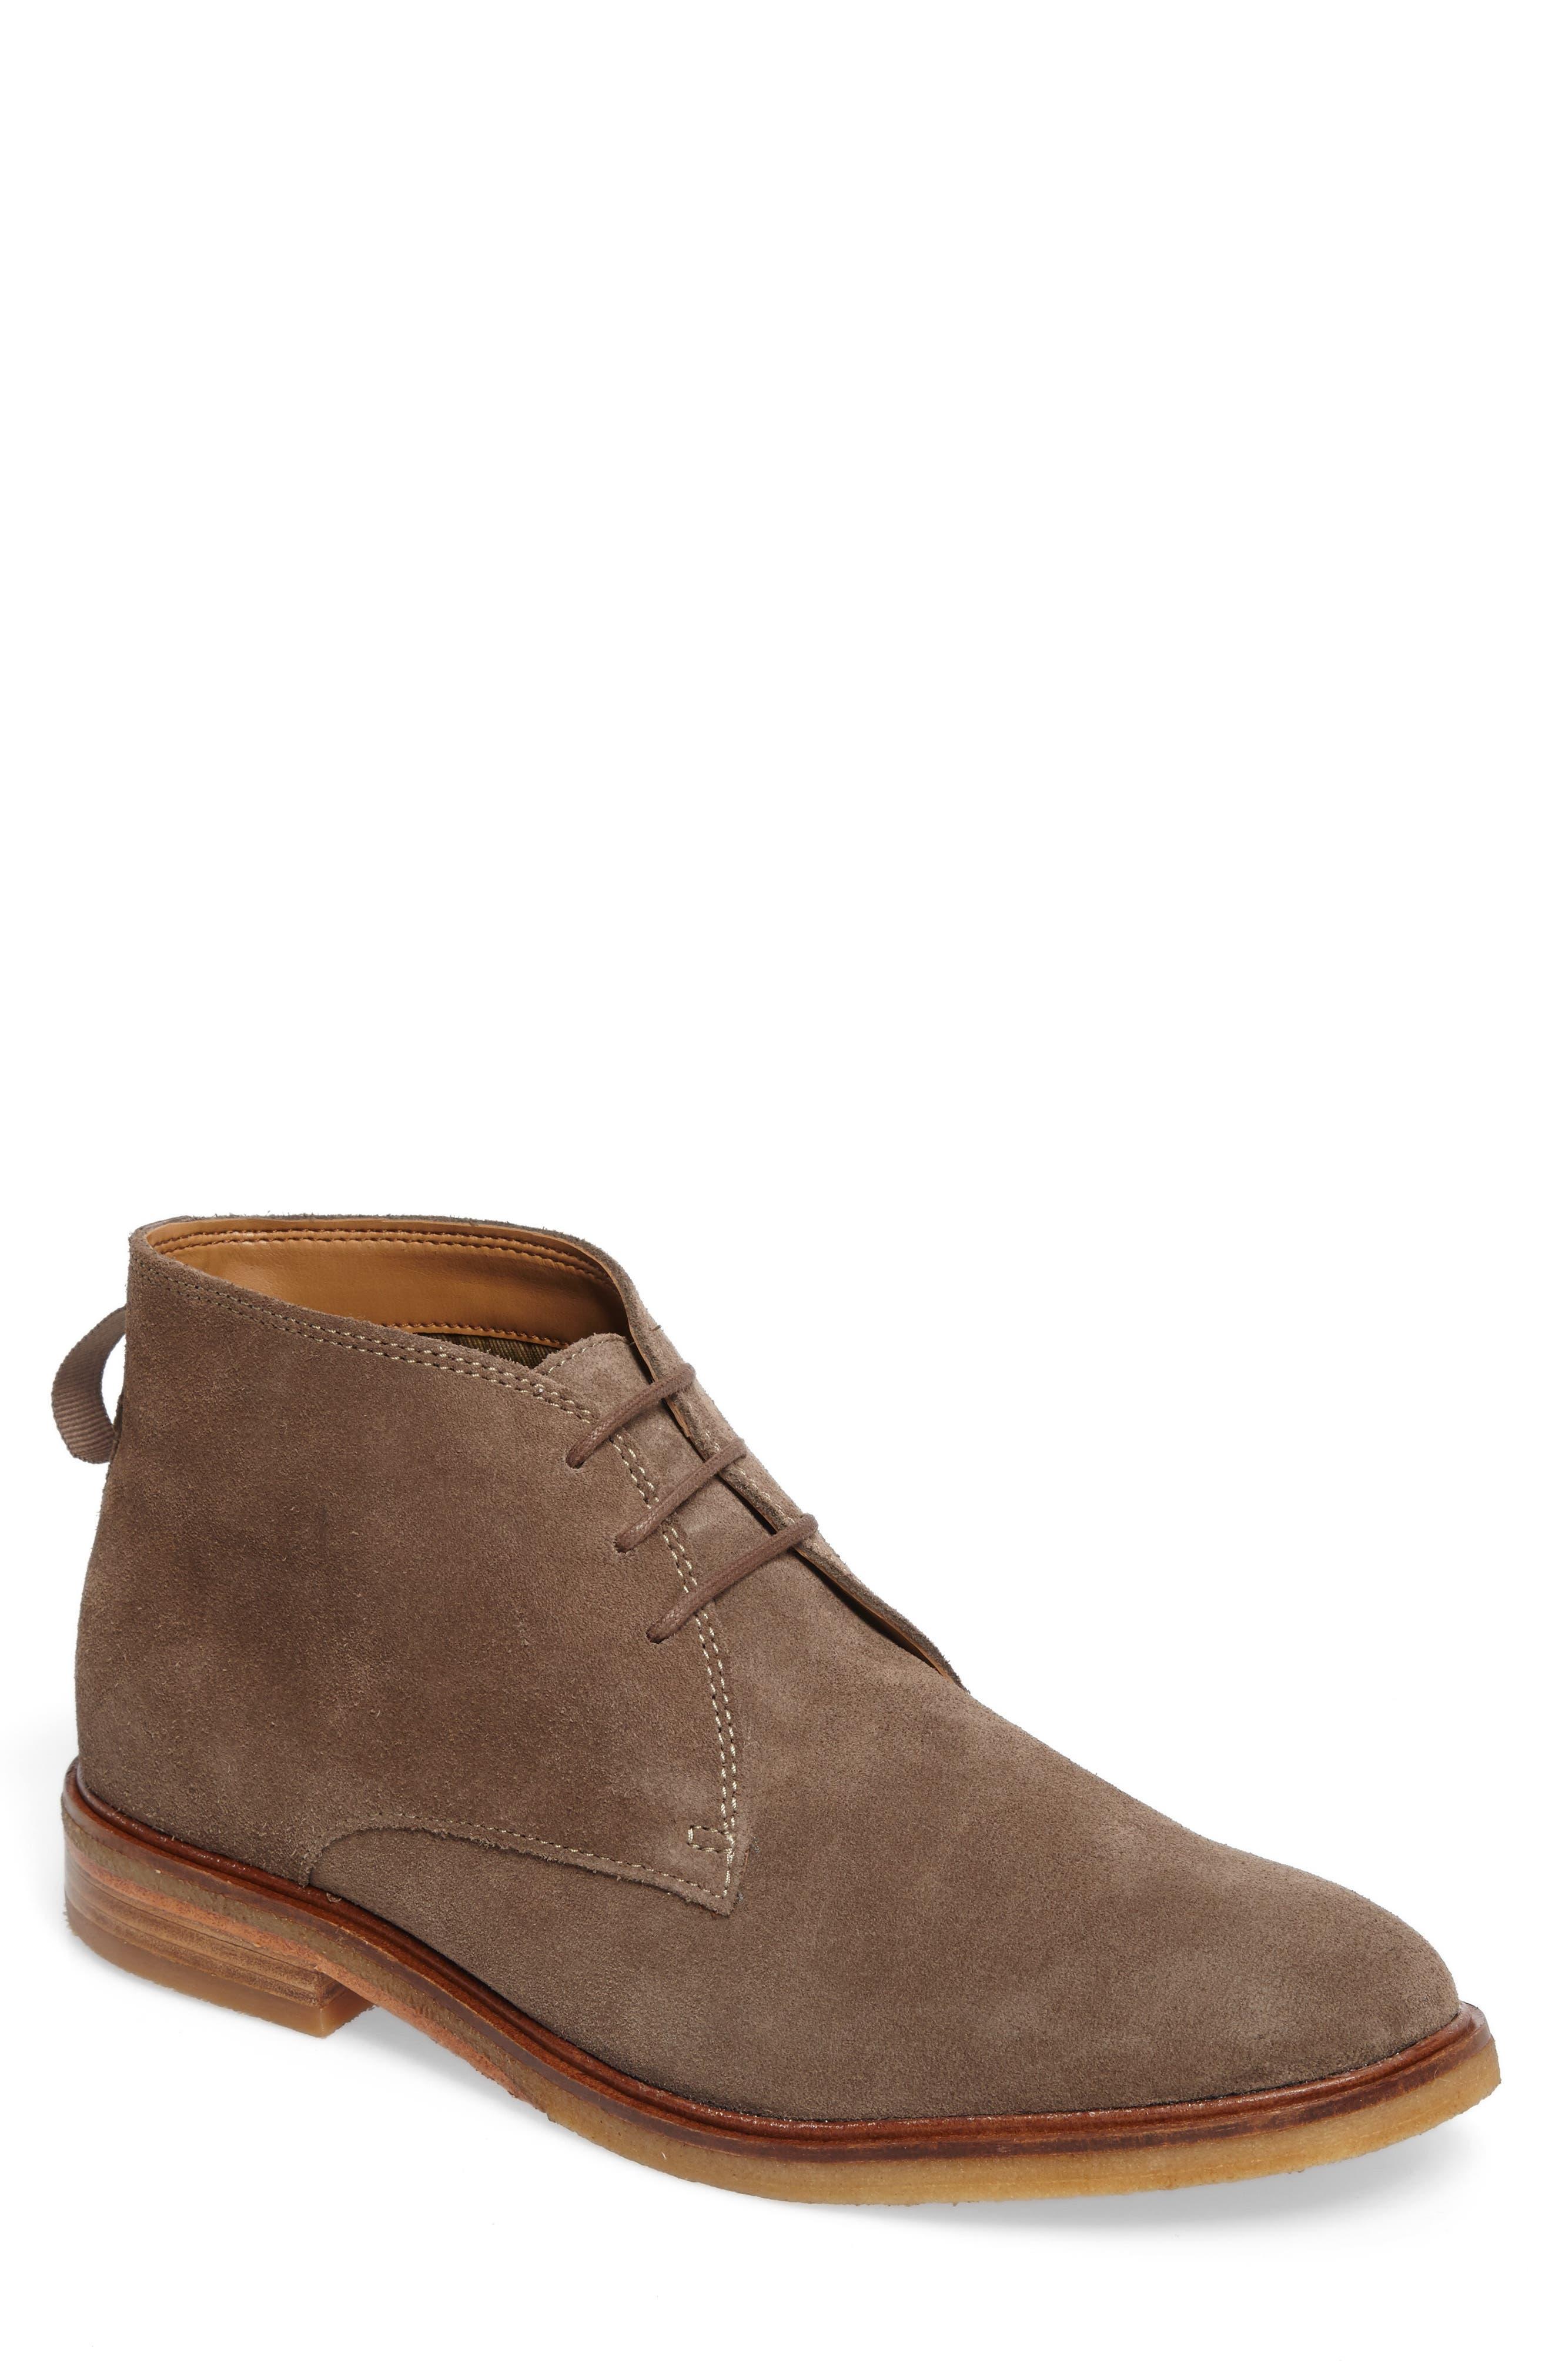 Clarkdale Chukka Boot,                         Main,                         color, 200